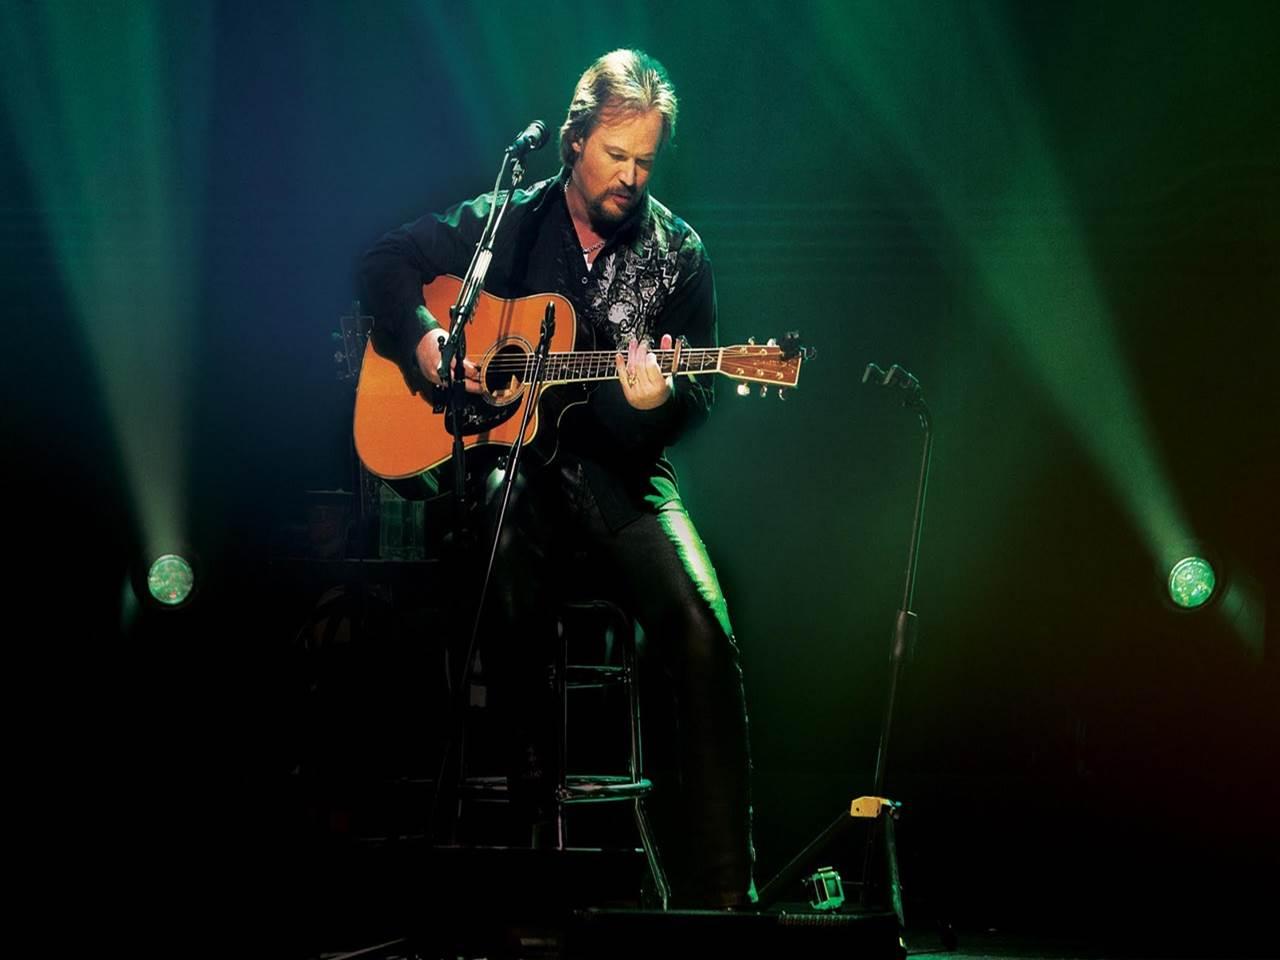 Travis tritt guitar